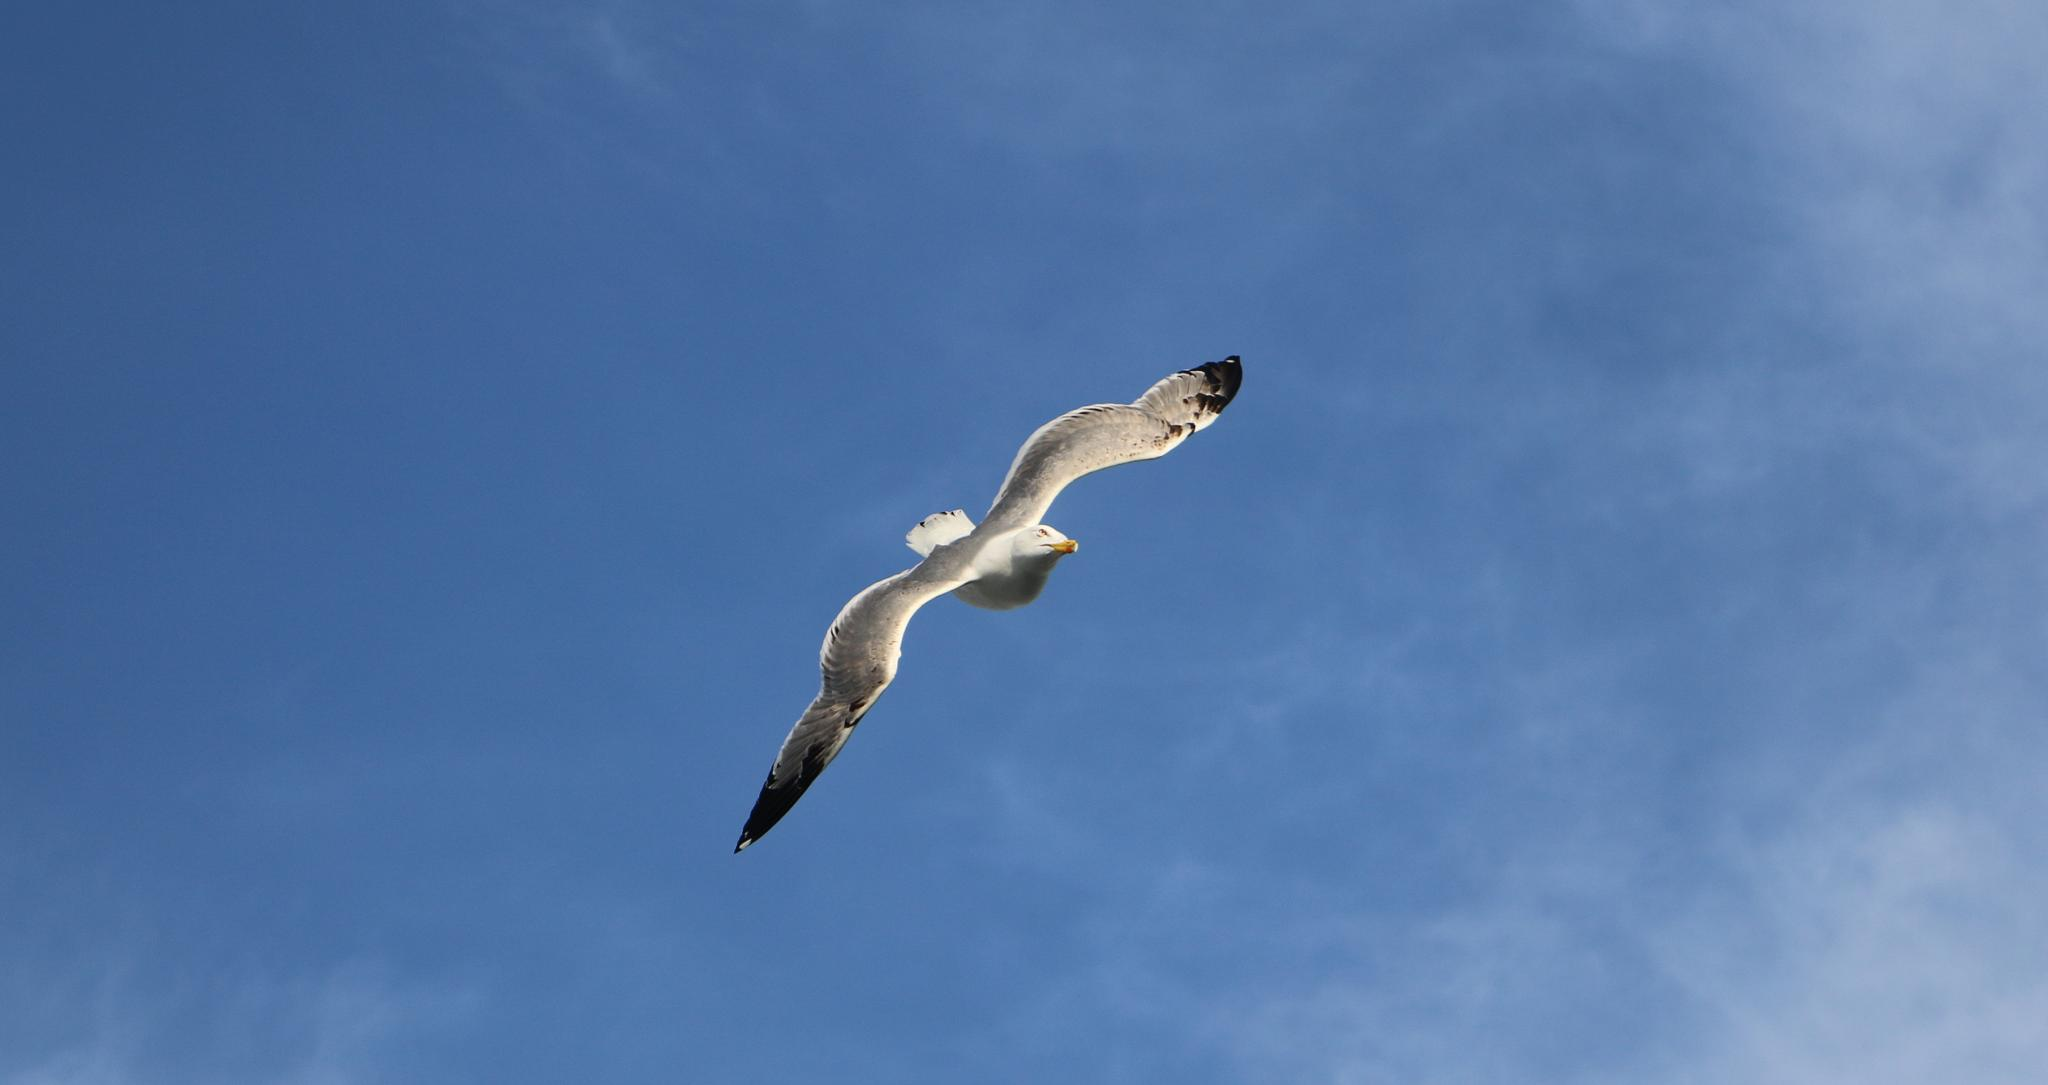 SEAGULL FLIGHING ONERHEAD by ACHILLEAS